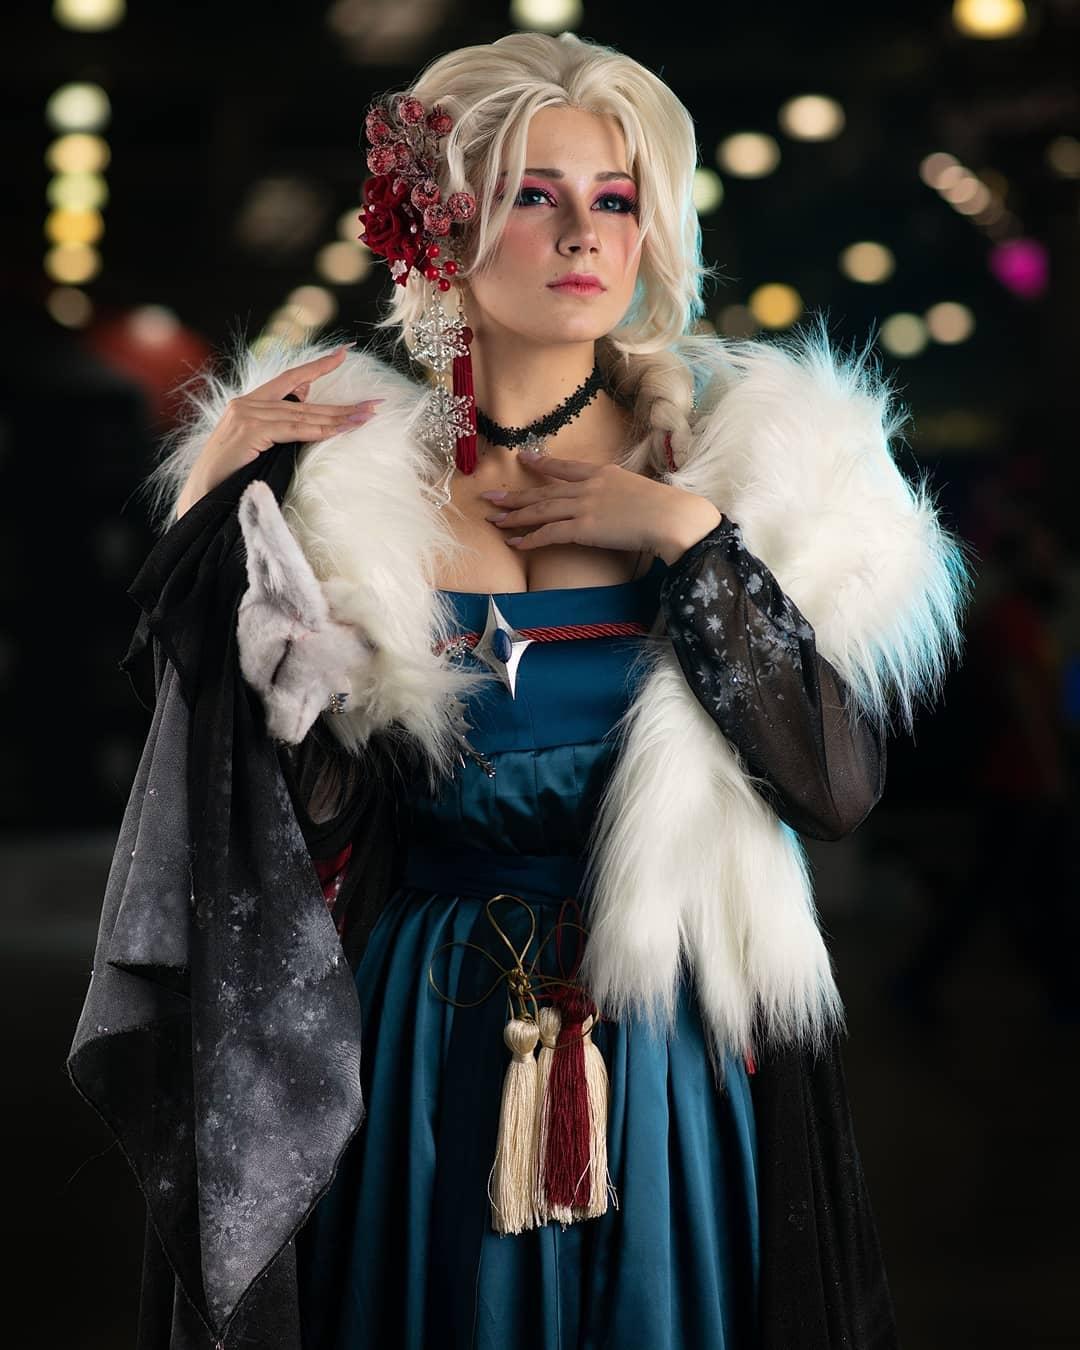 Elsa cosplay by cosplayer Oichichan